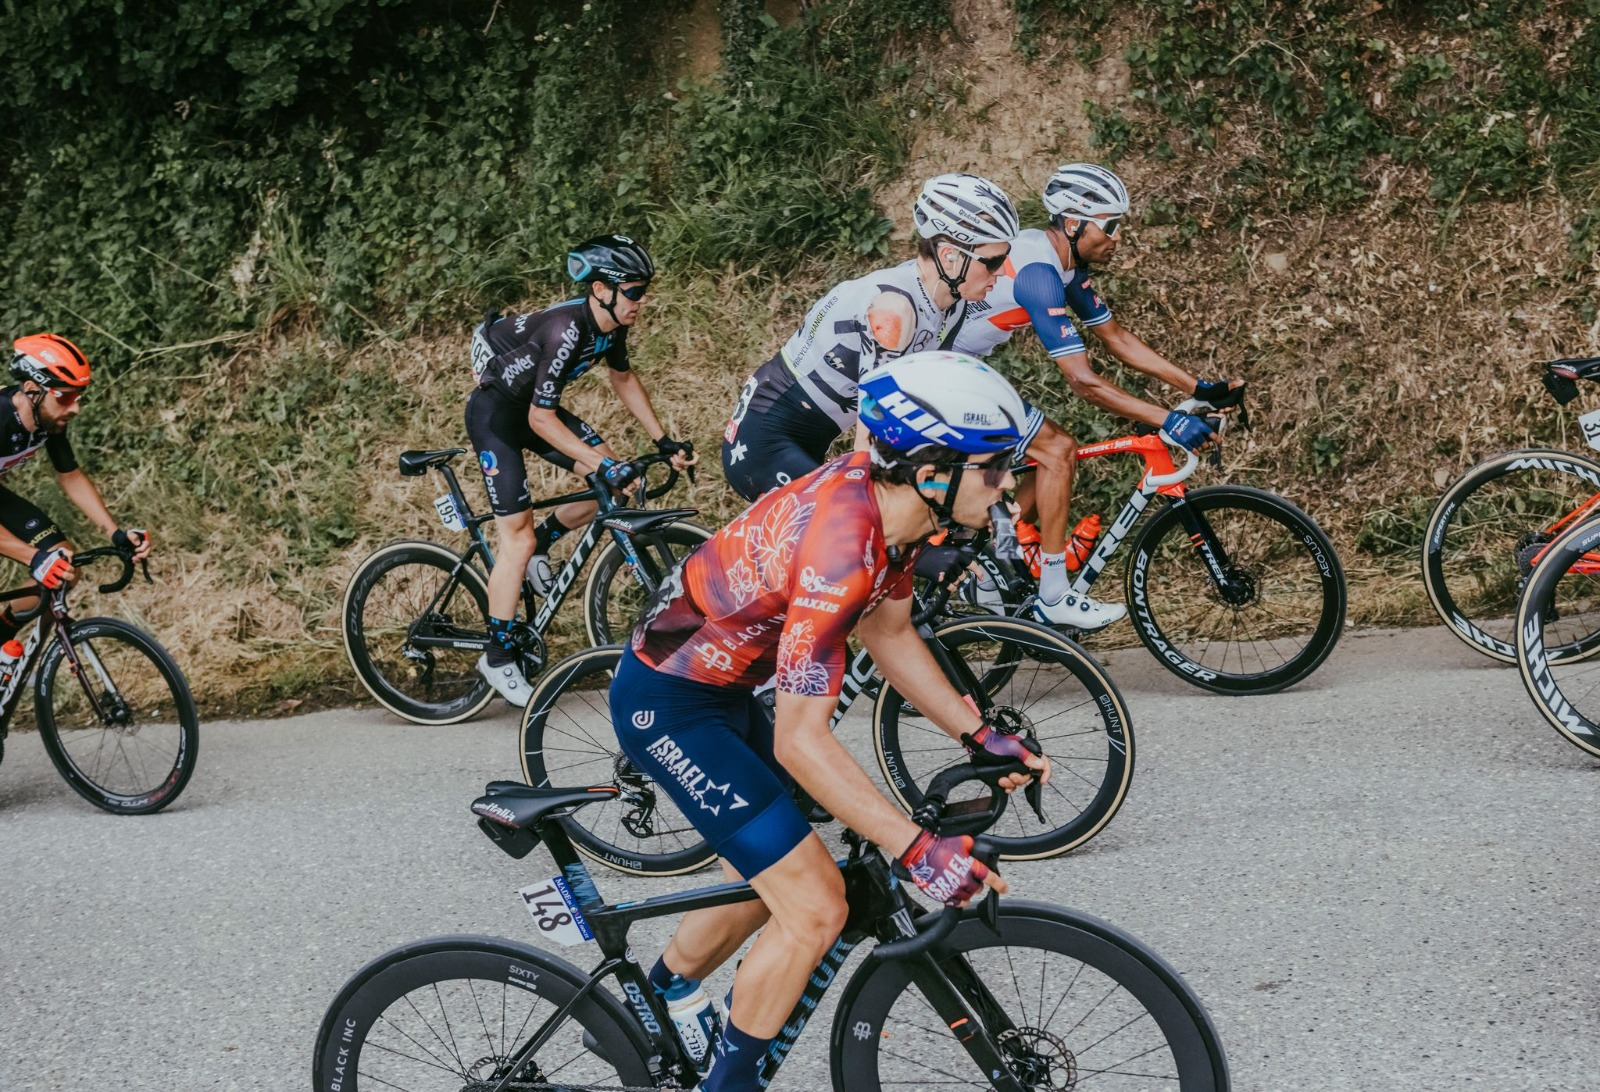 ISN, with Dan Martin finishing in the peloton, rounds off stage 15 in Giro